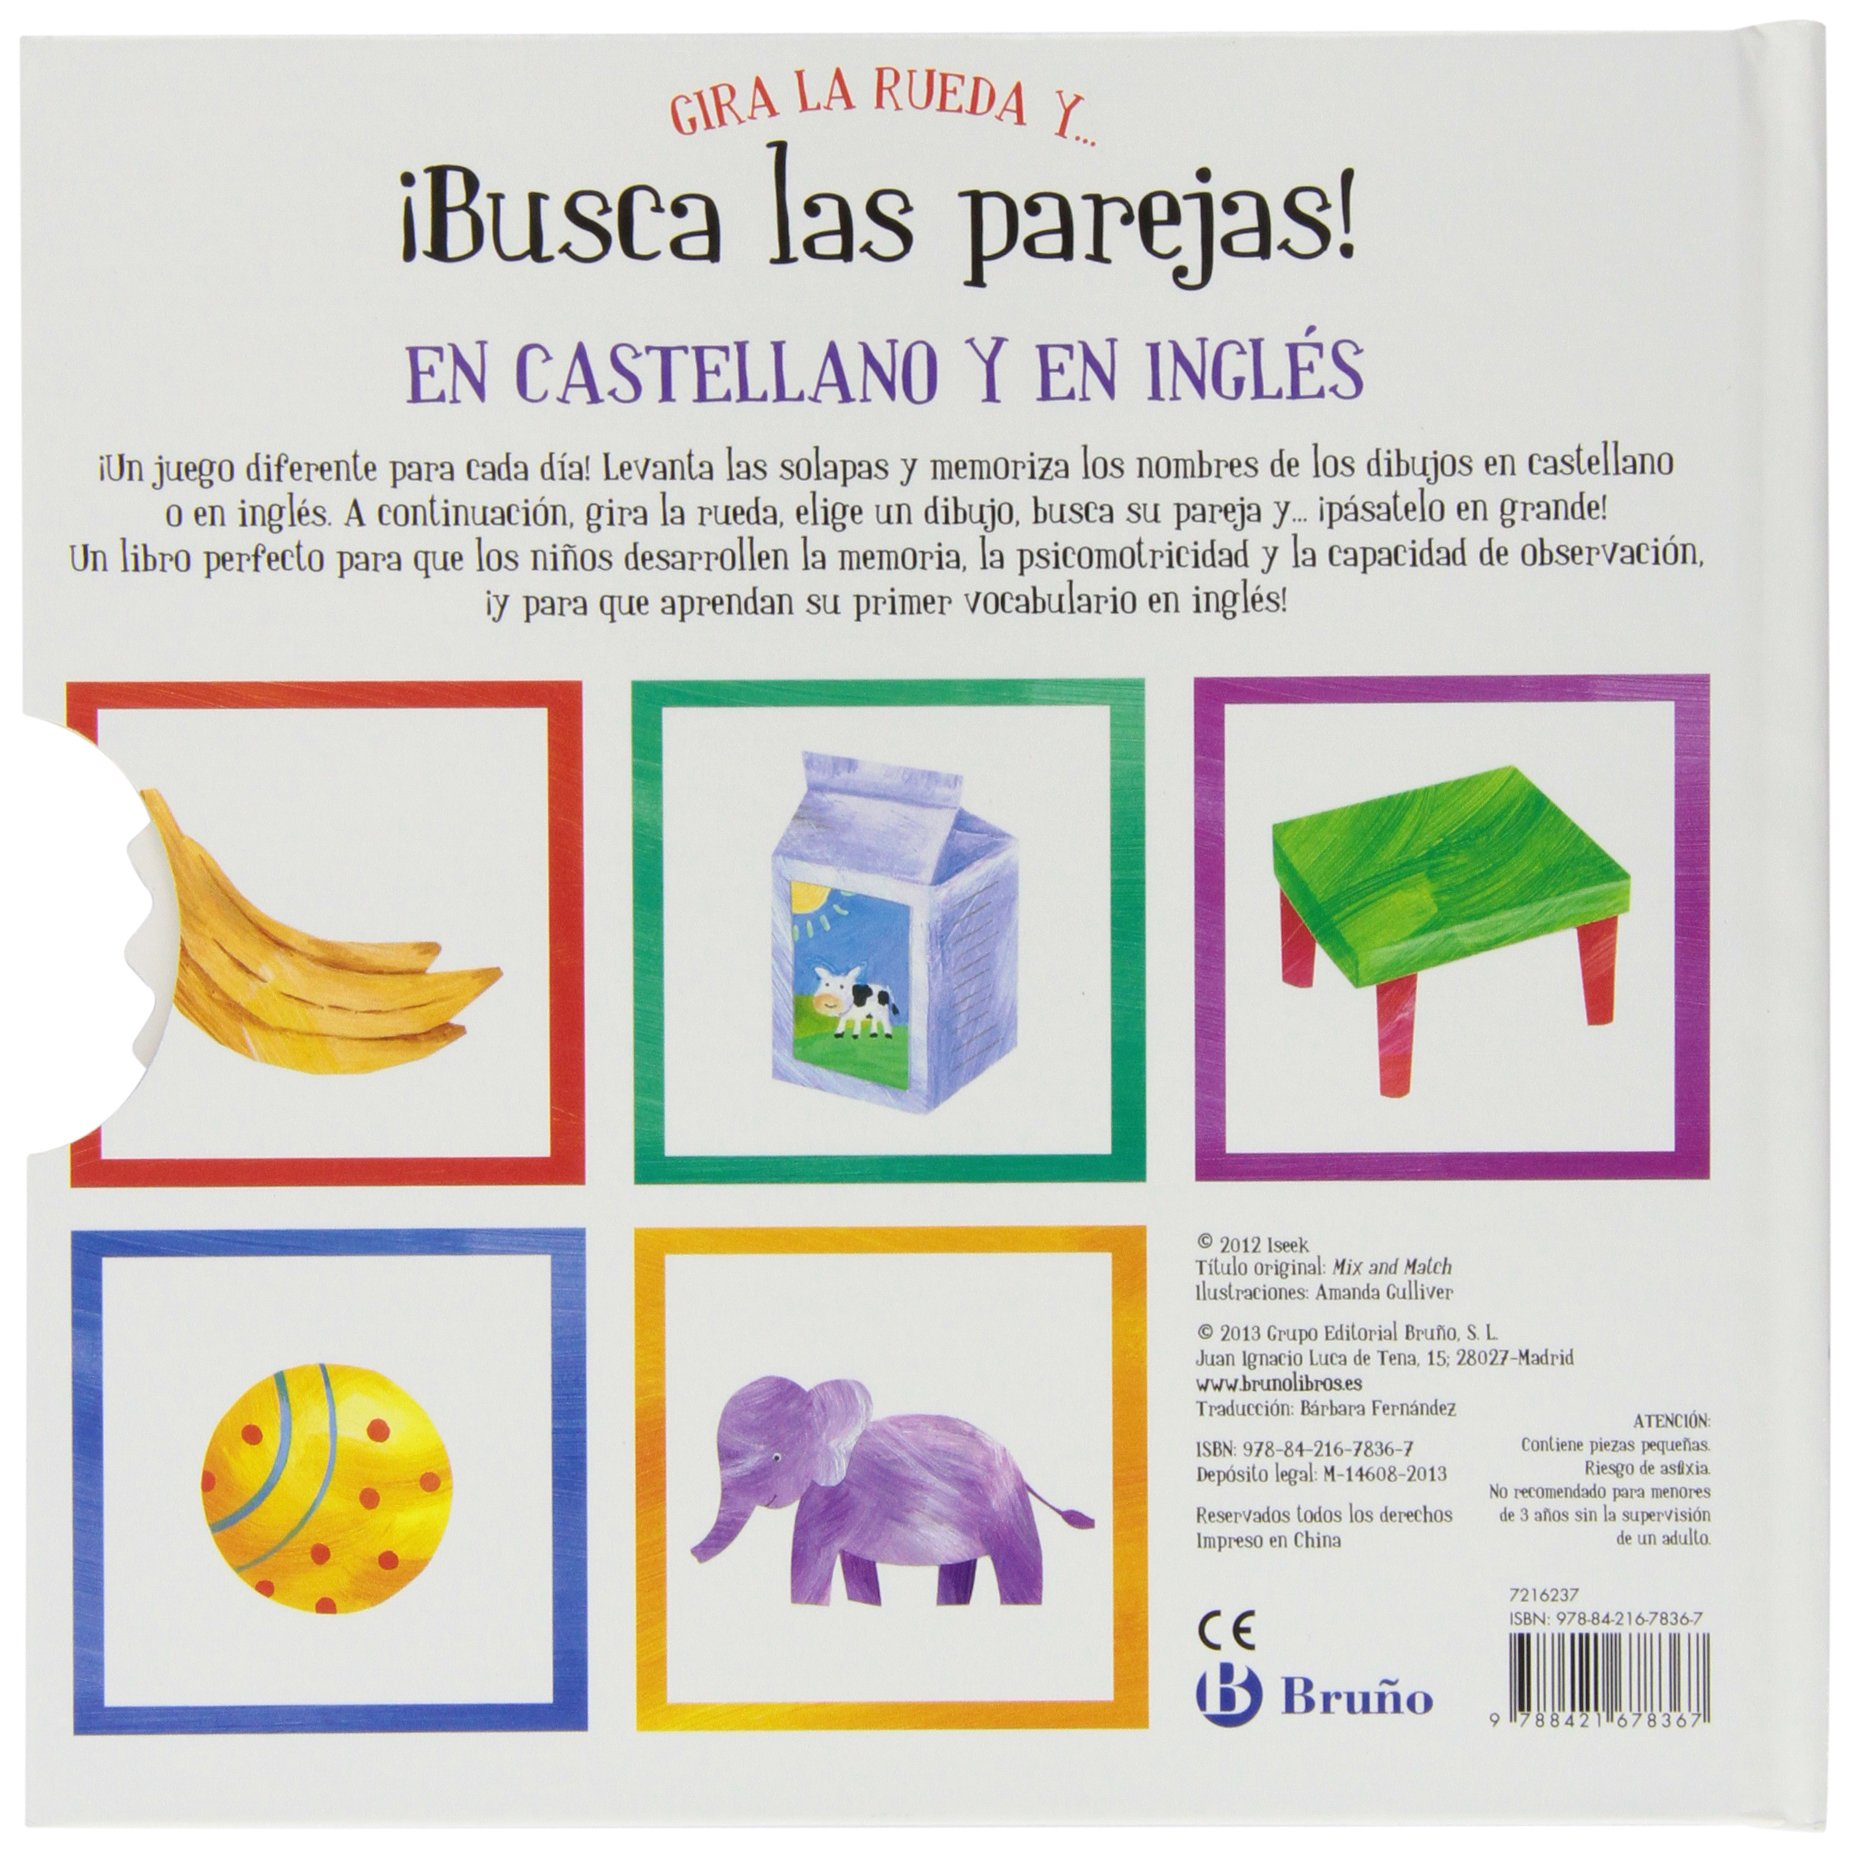 Gira la rueda y... ¡busca las parejas! / Mix and Match (Spanish and English Edition): Amanda Gulliver, Bárbara Fernández: 9788421678367: Amazon.com: Books